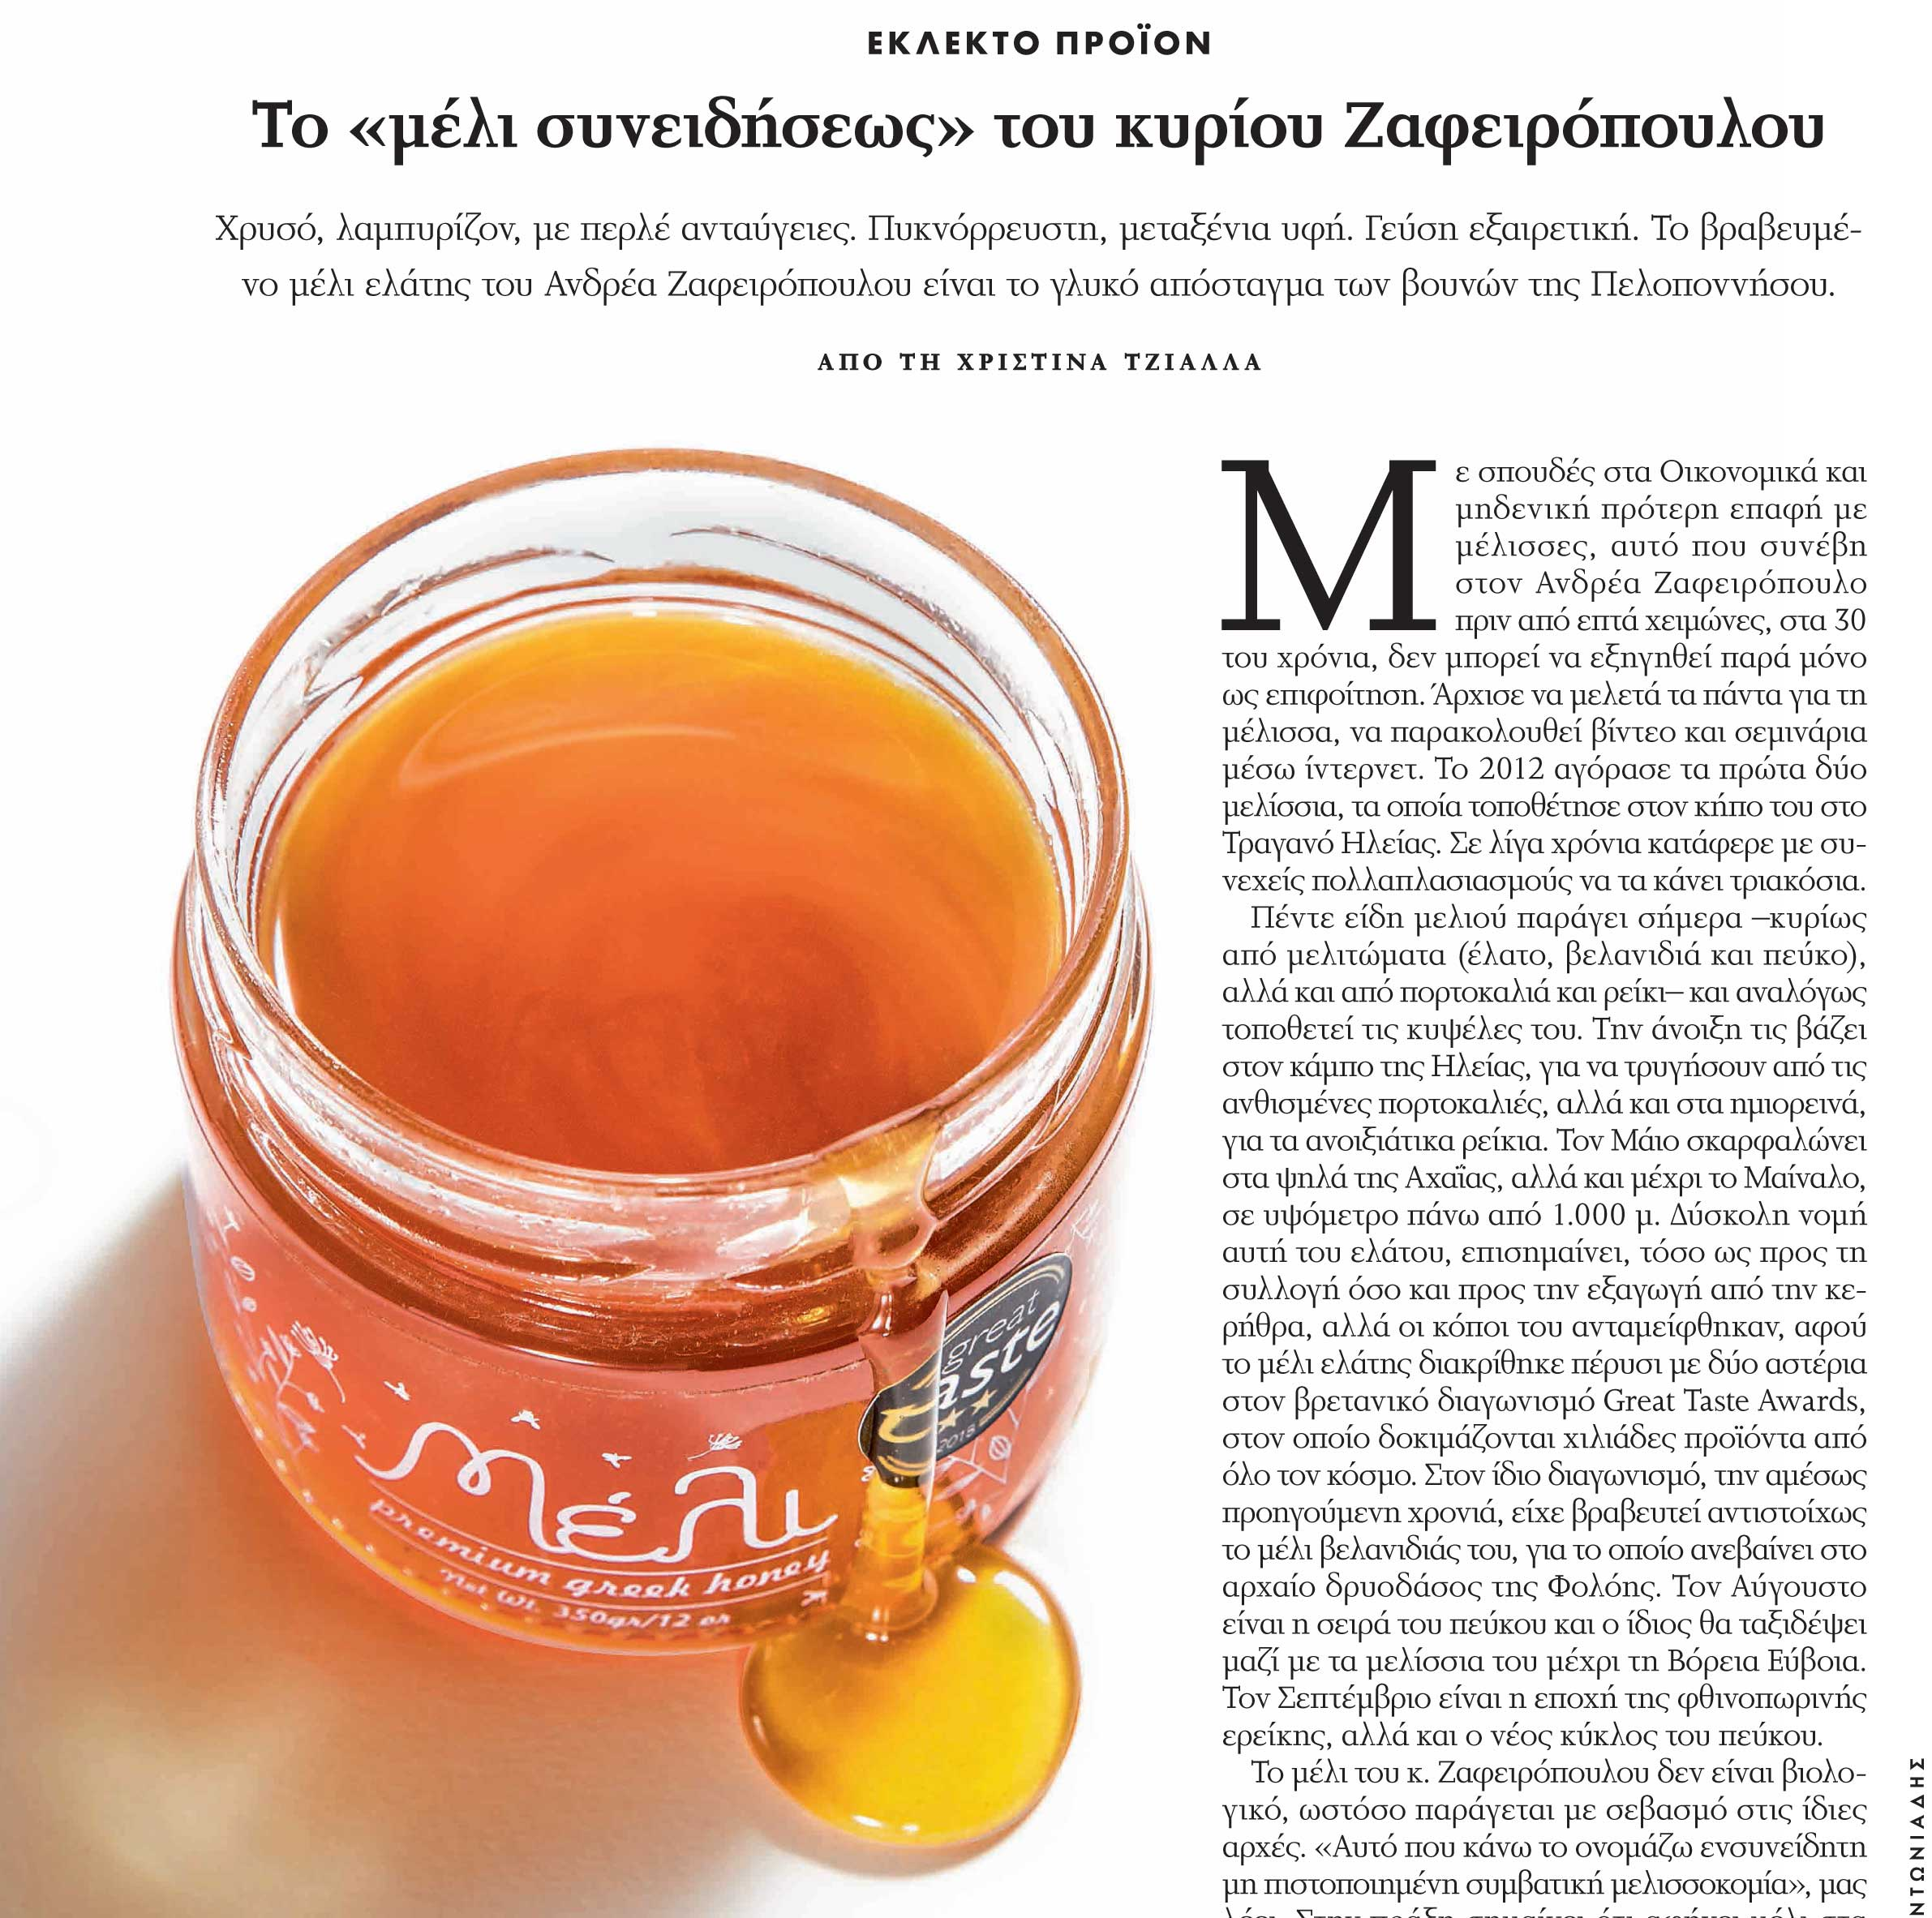 Article about Meli Honey in Gastronomos – Kathimerini